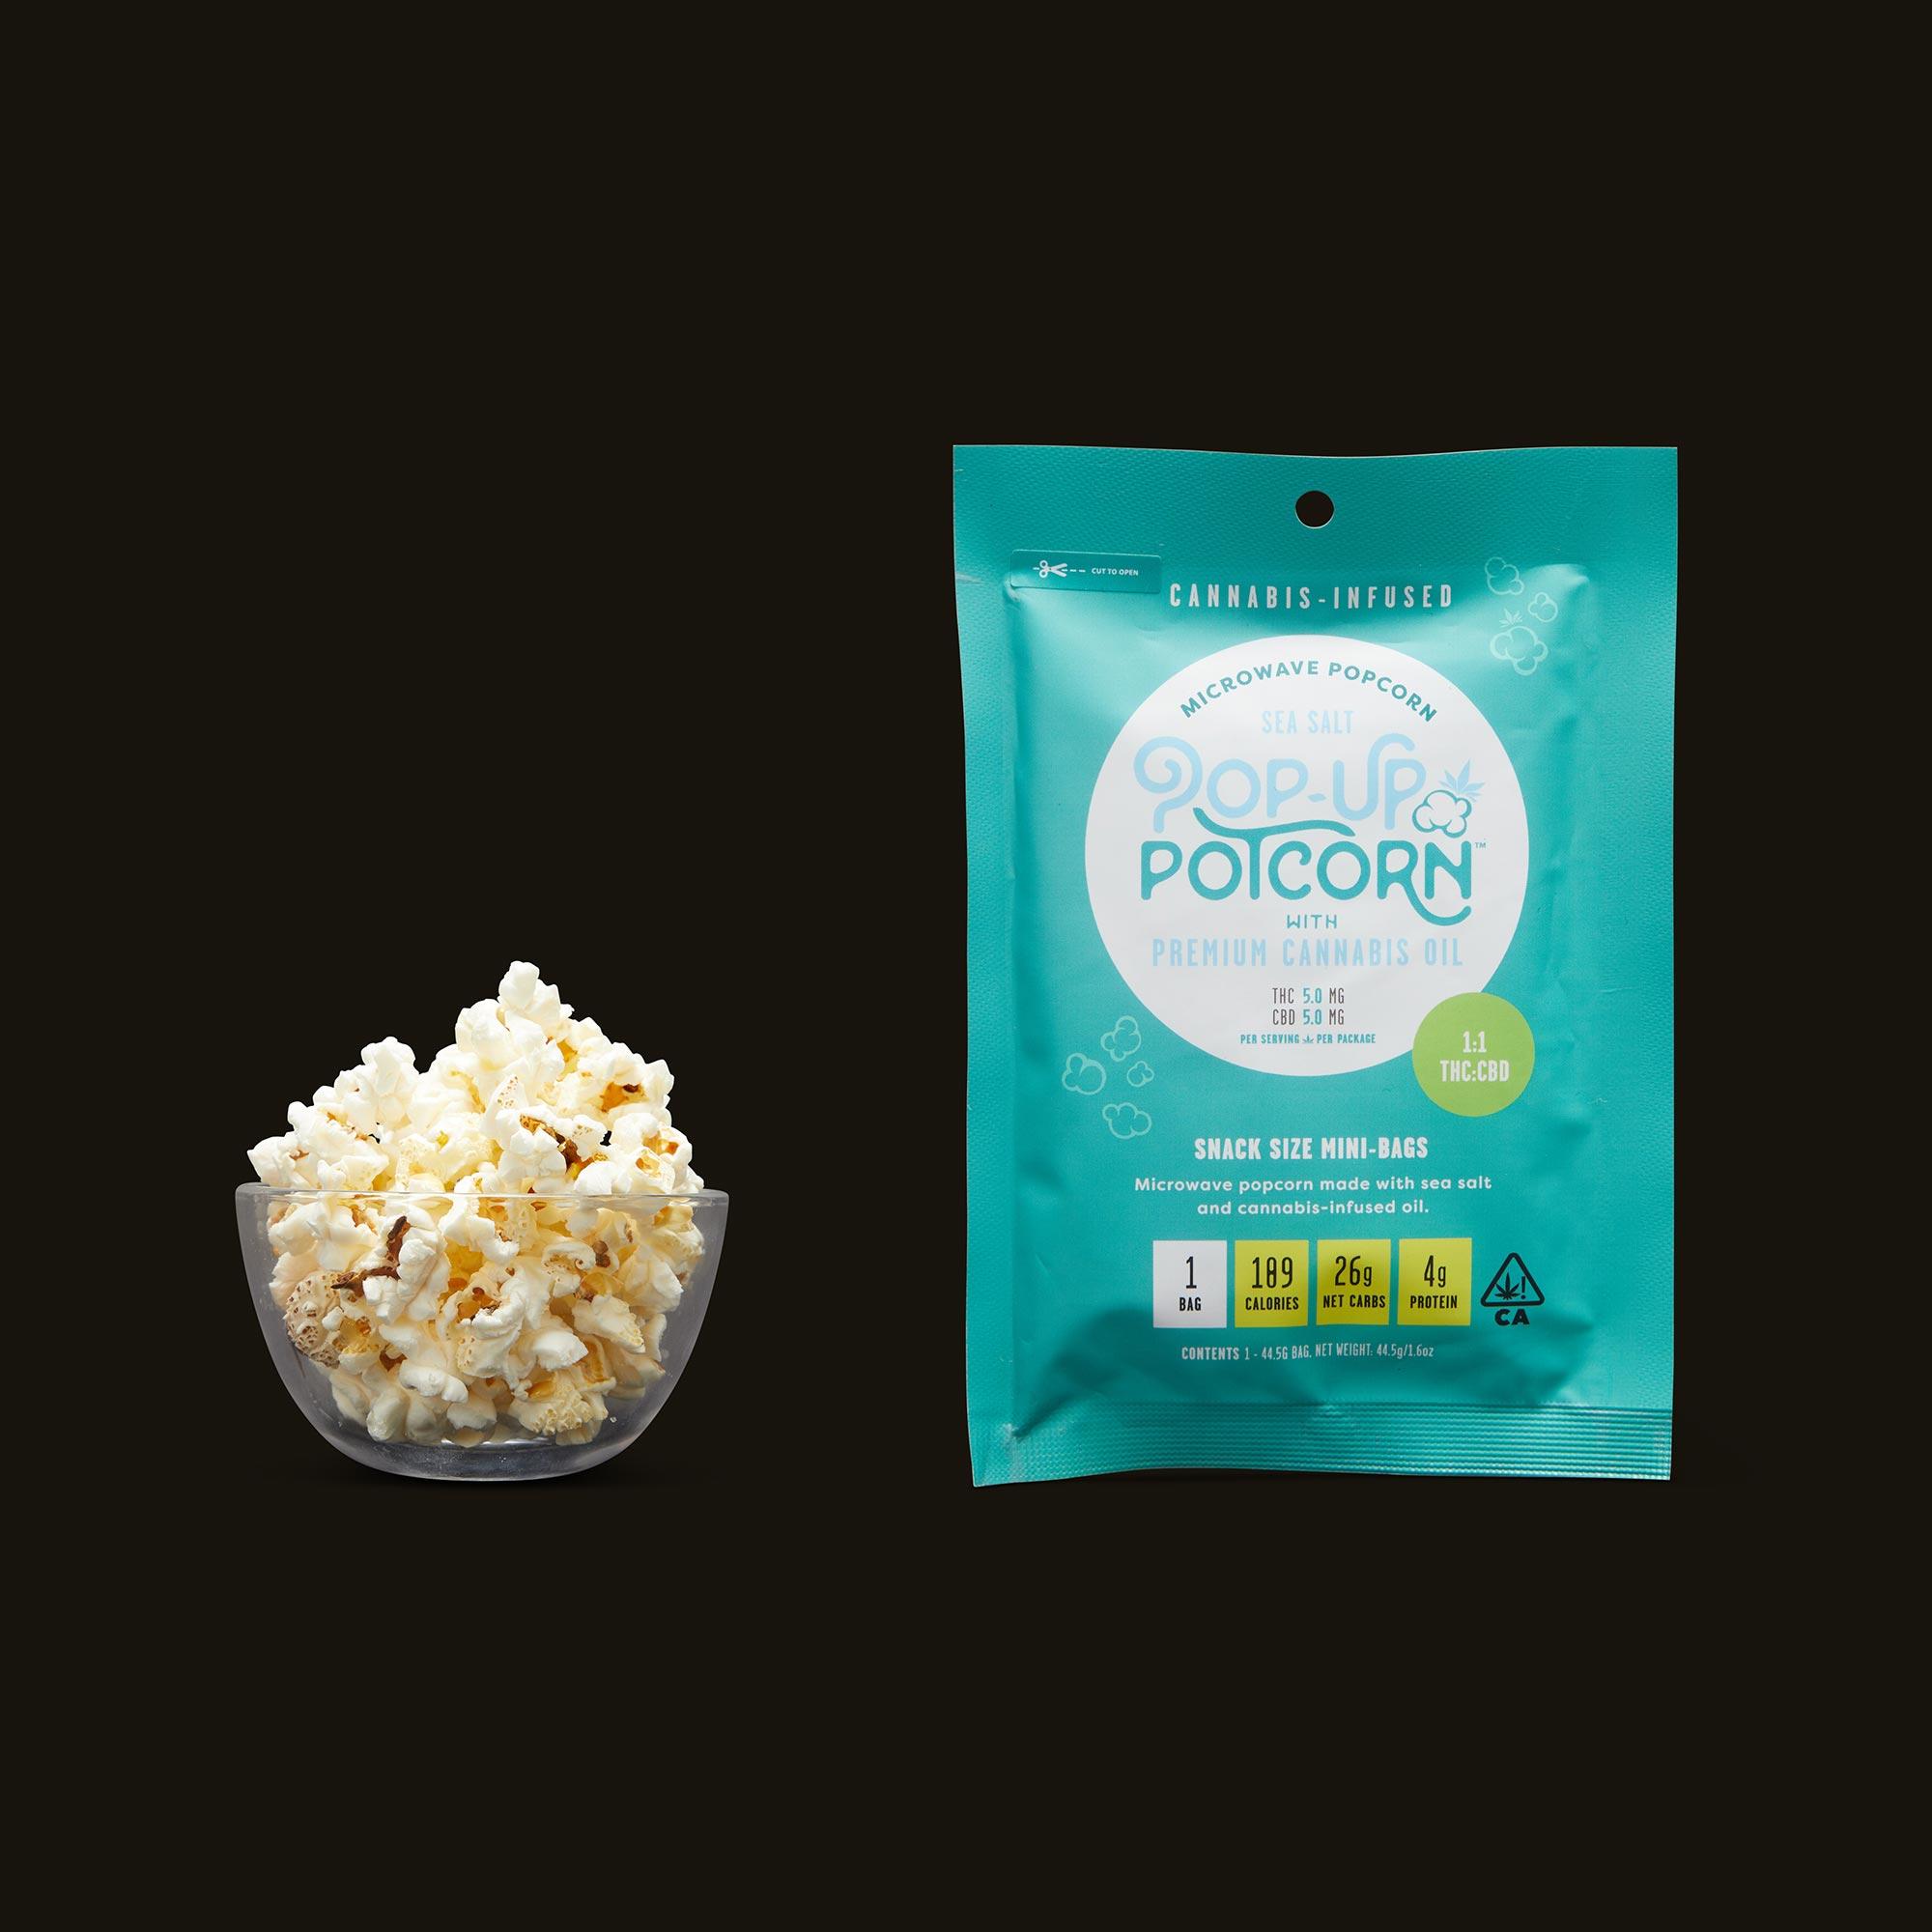 A bowl of Pop-Up Potcorn Sea Salt Microwave Popcorn 1:1 - Single